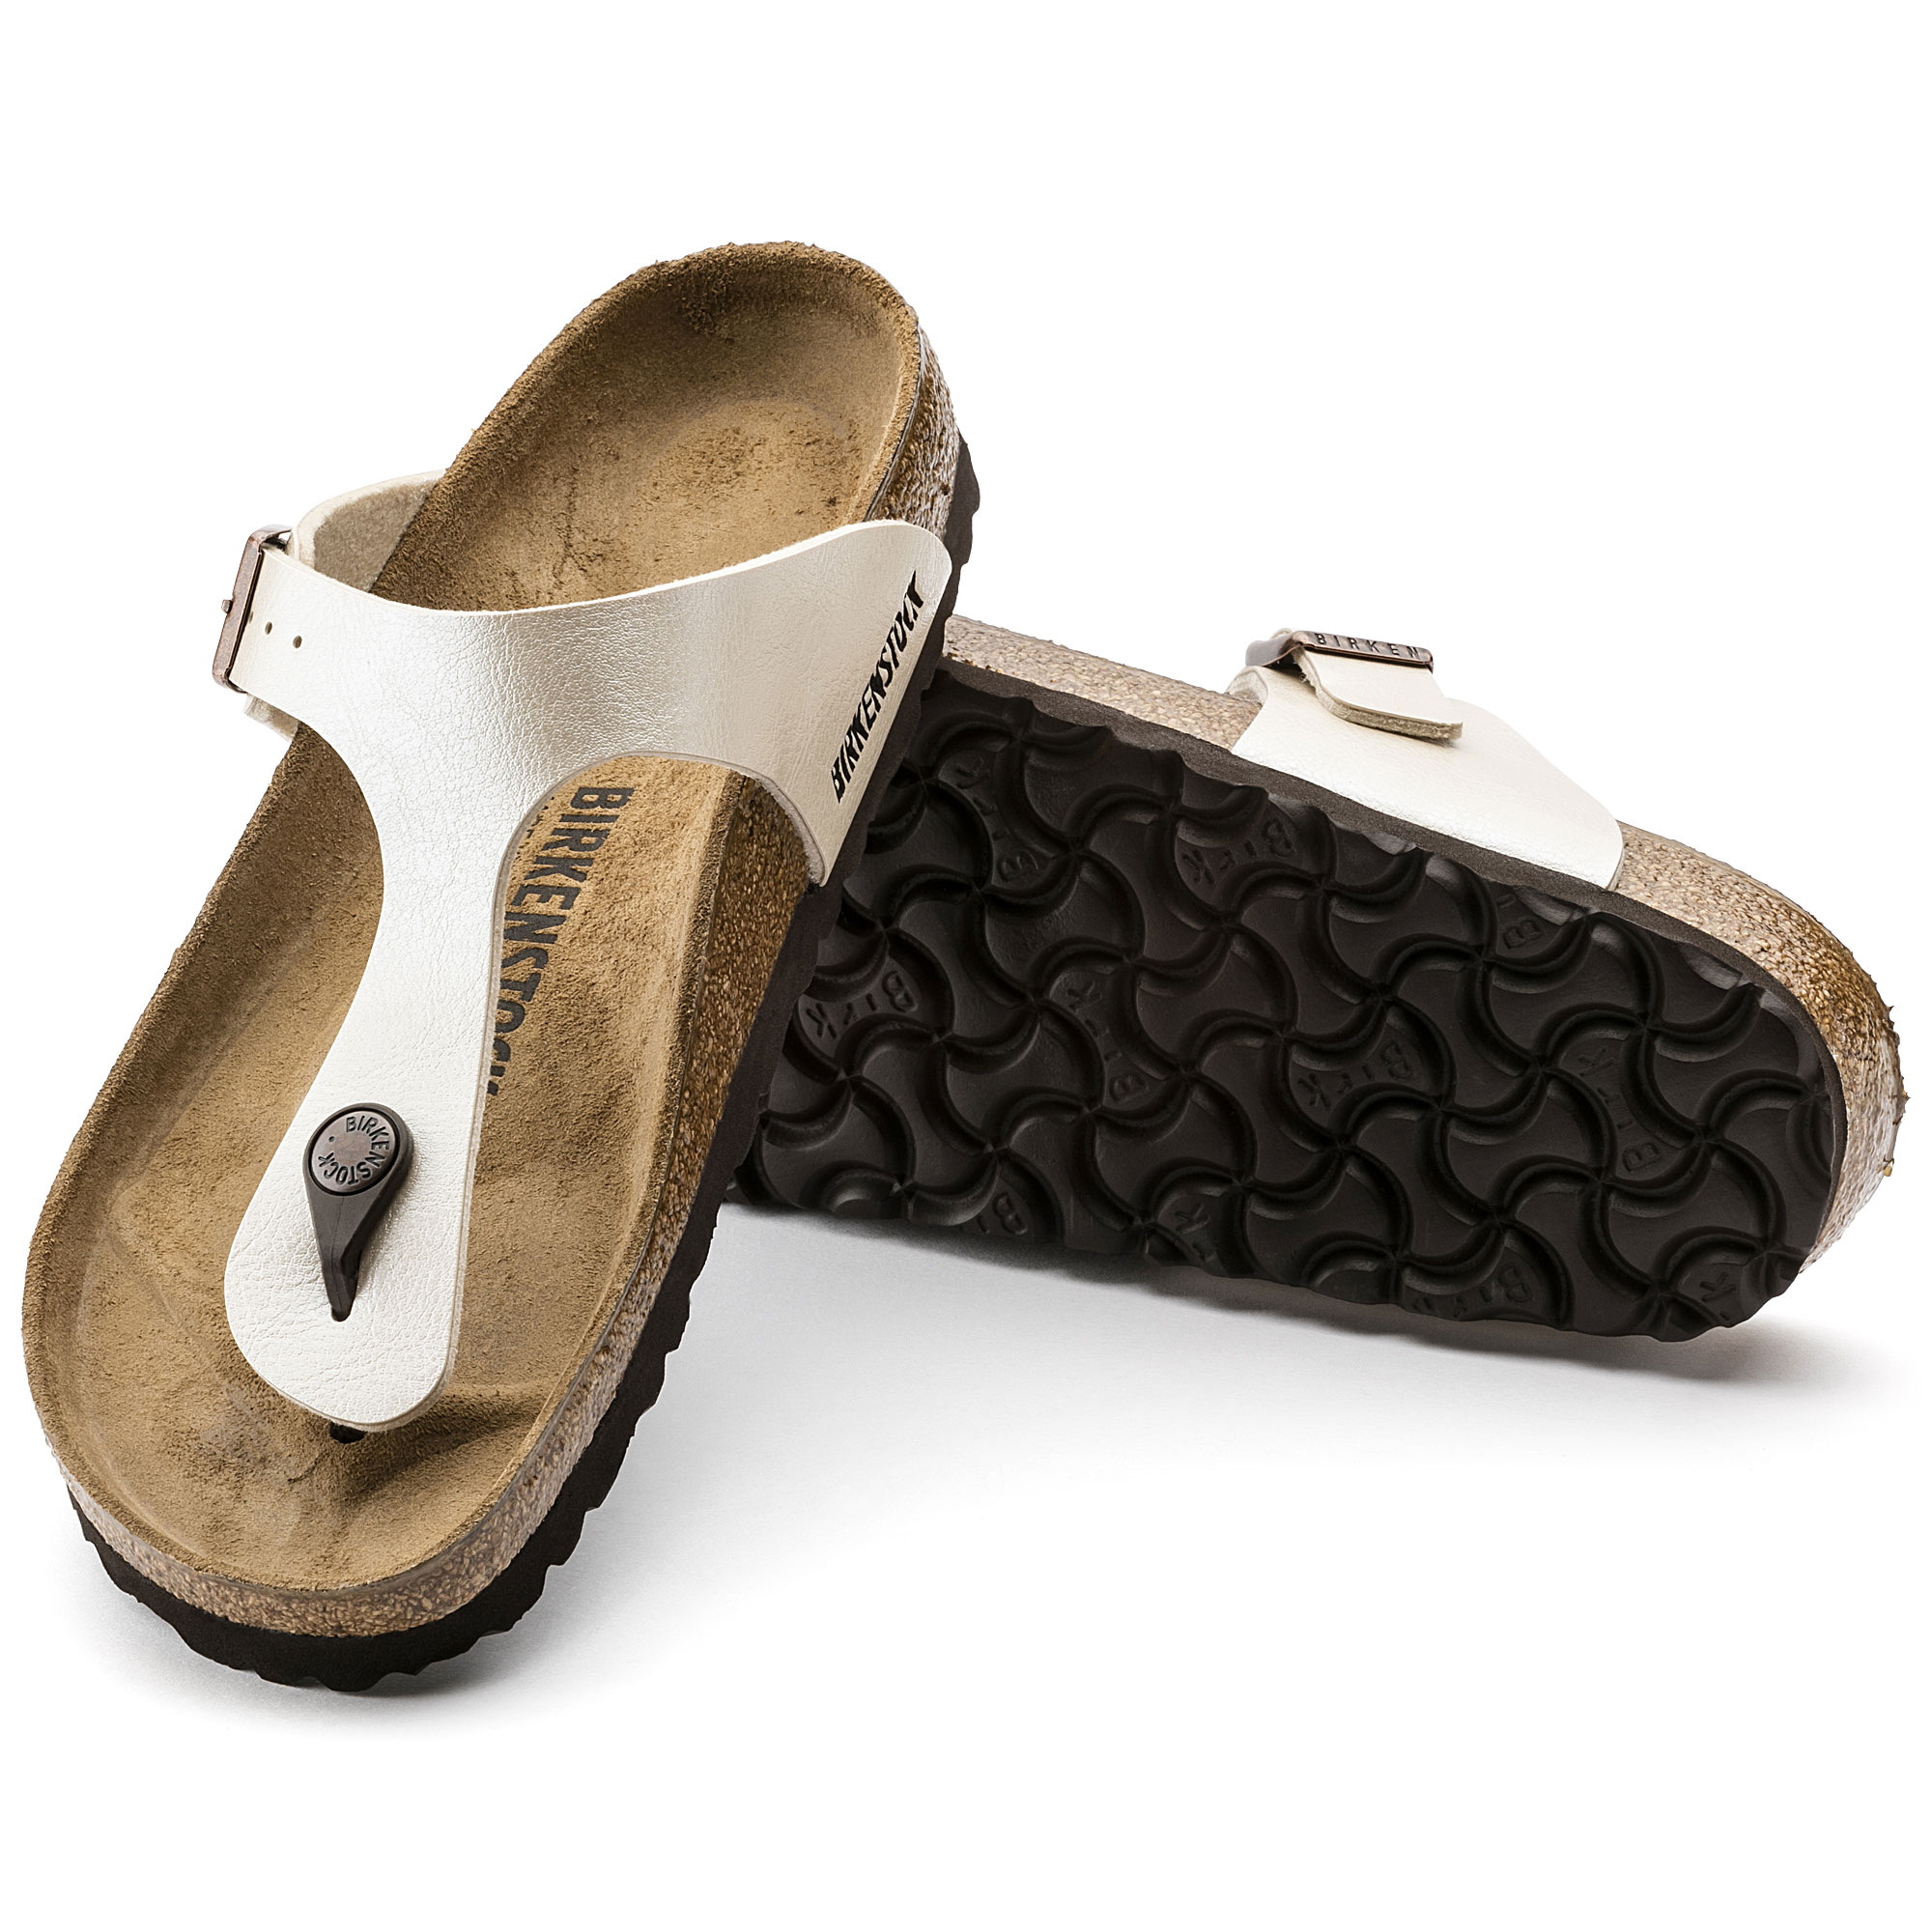 Antique Lace Birkenstock Gizeh Leather Comfortable Shoes